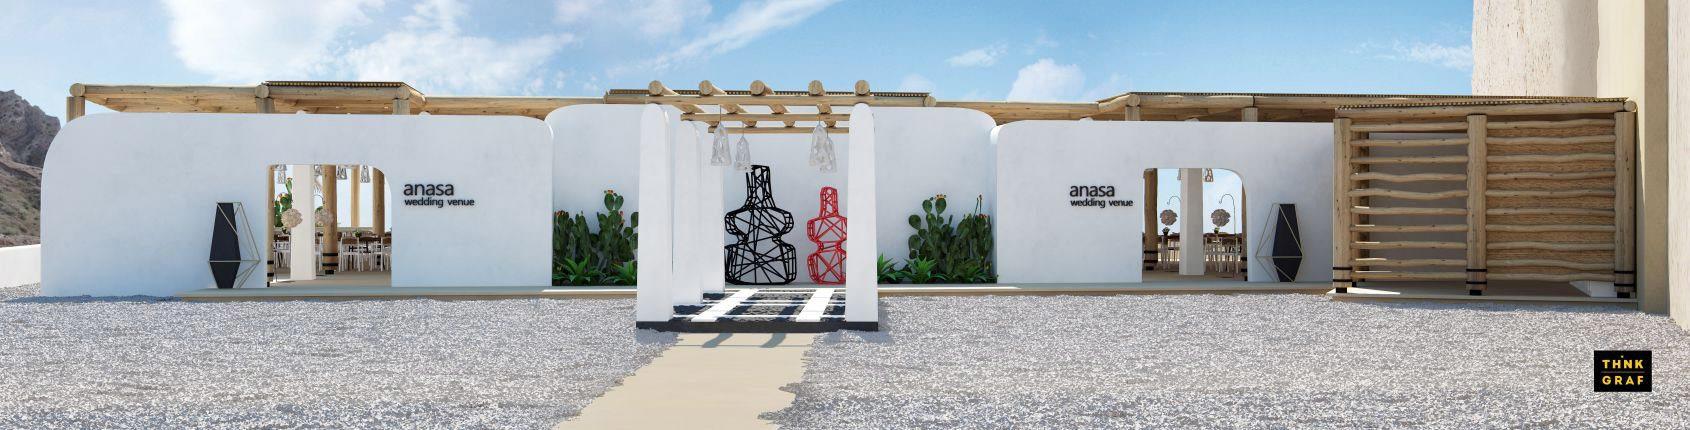 Anasa χώρος δεξιώσεων γάμου τρισδιάστατος σχεδιασμός & φωτορεαλισμός